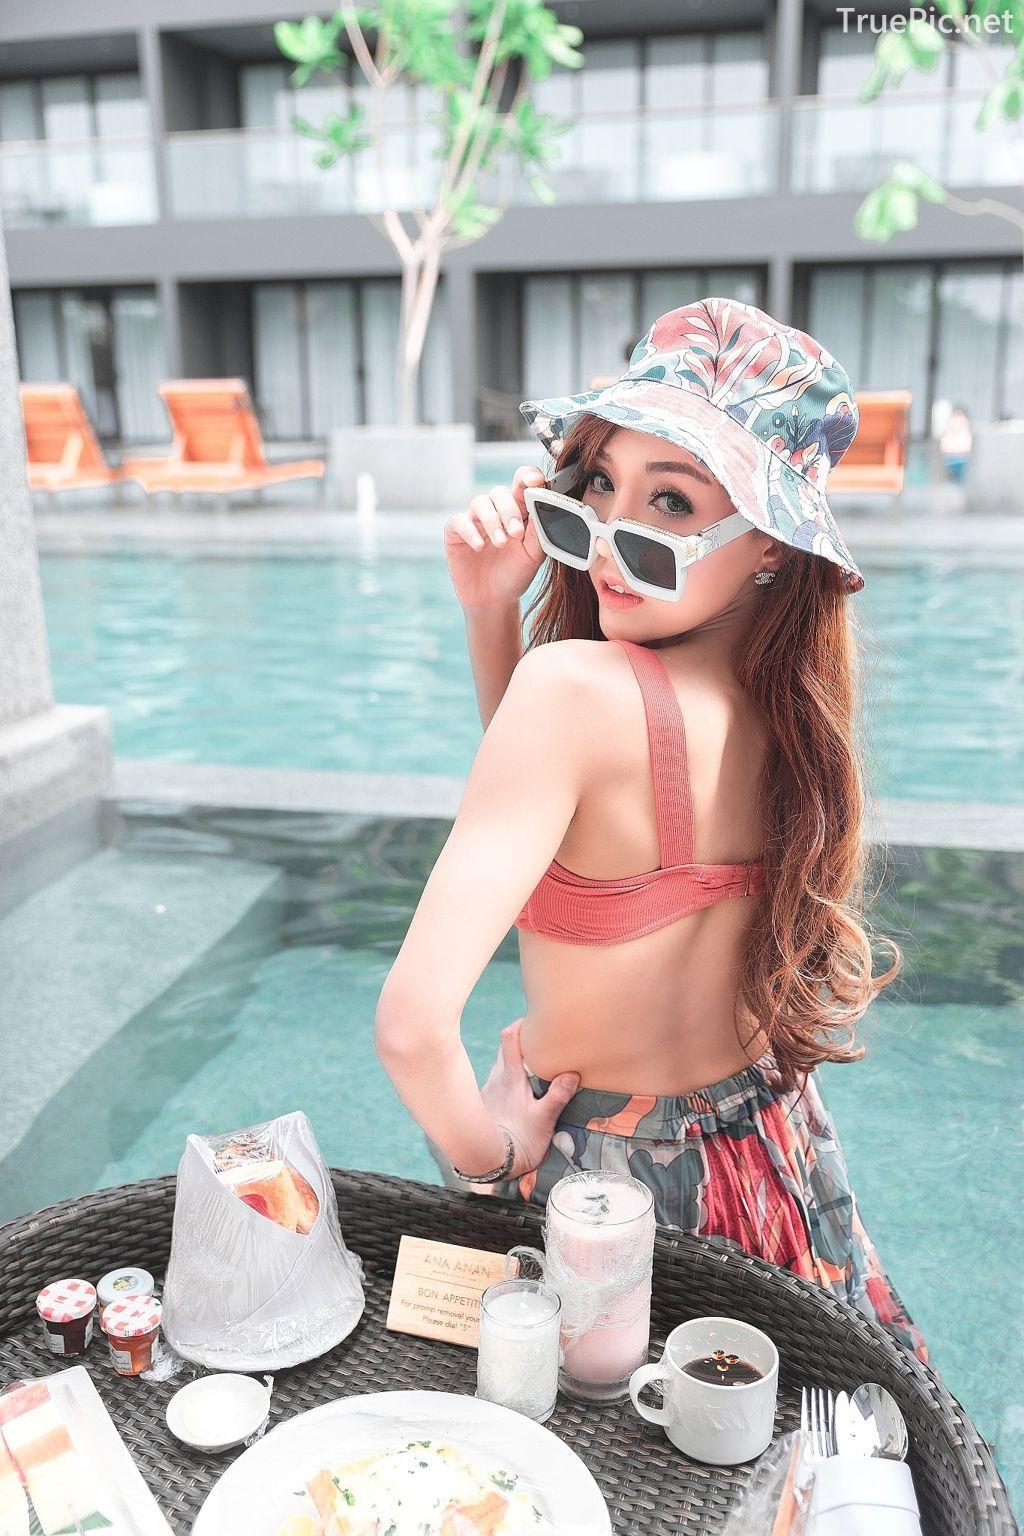 Thailand model - I'nam Arissara Chaidech - Pink Bikini on the beach - TruePic.net - Picture 1